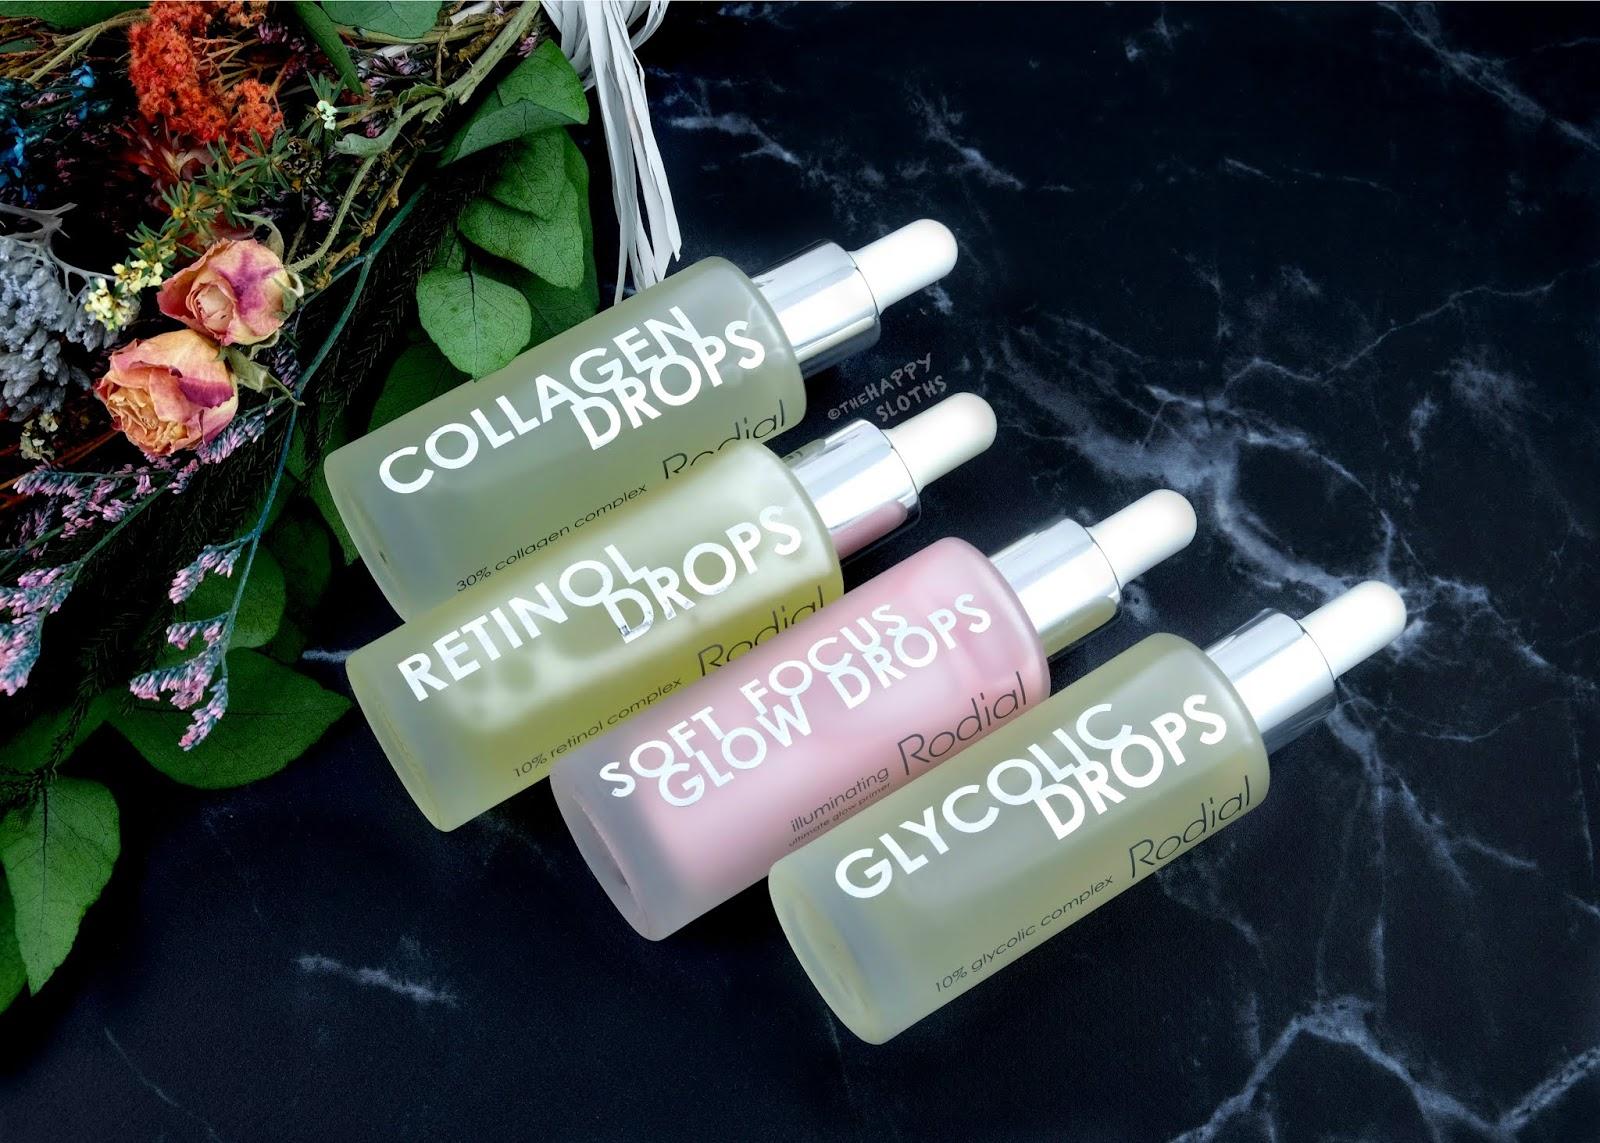 Rodial   Glycolic Drops, Retinol Drops, Collagen Drops & Soft Focus Glow Drops: Review